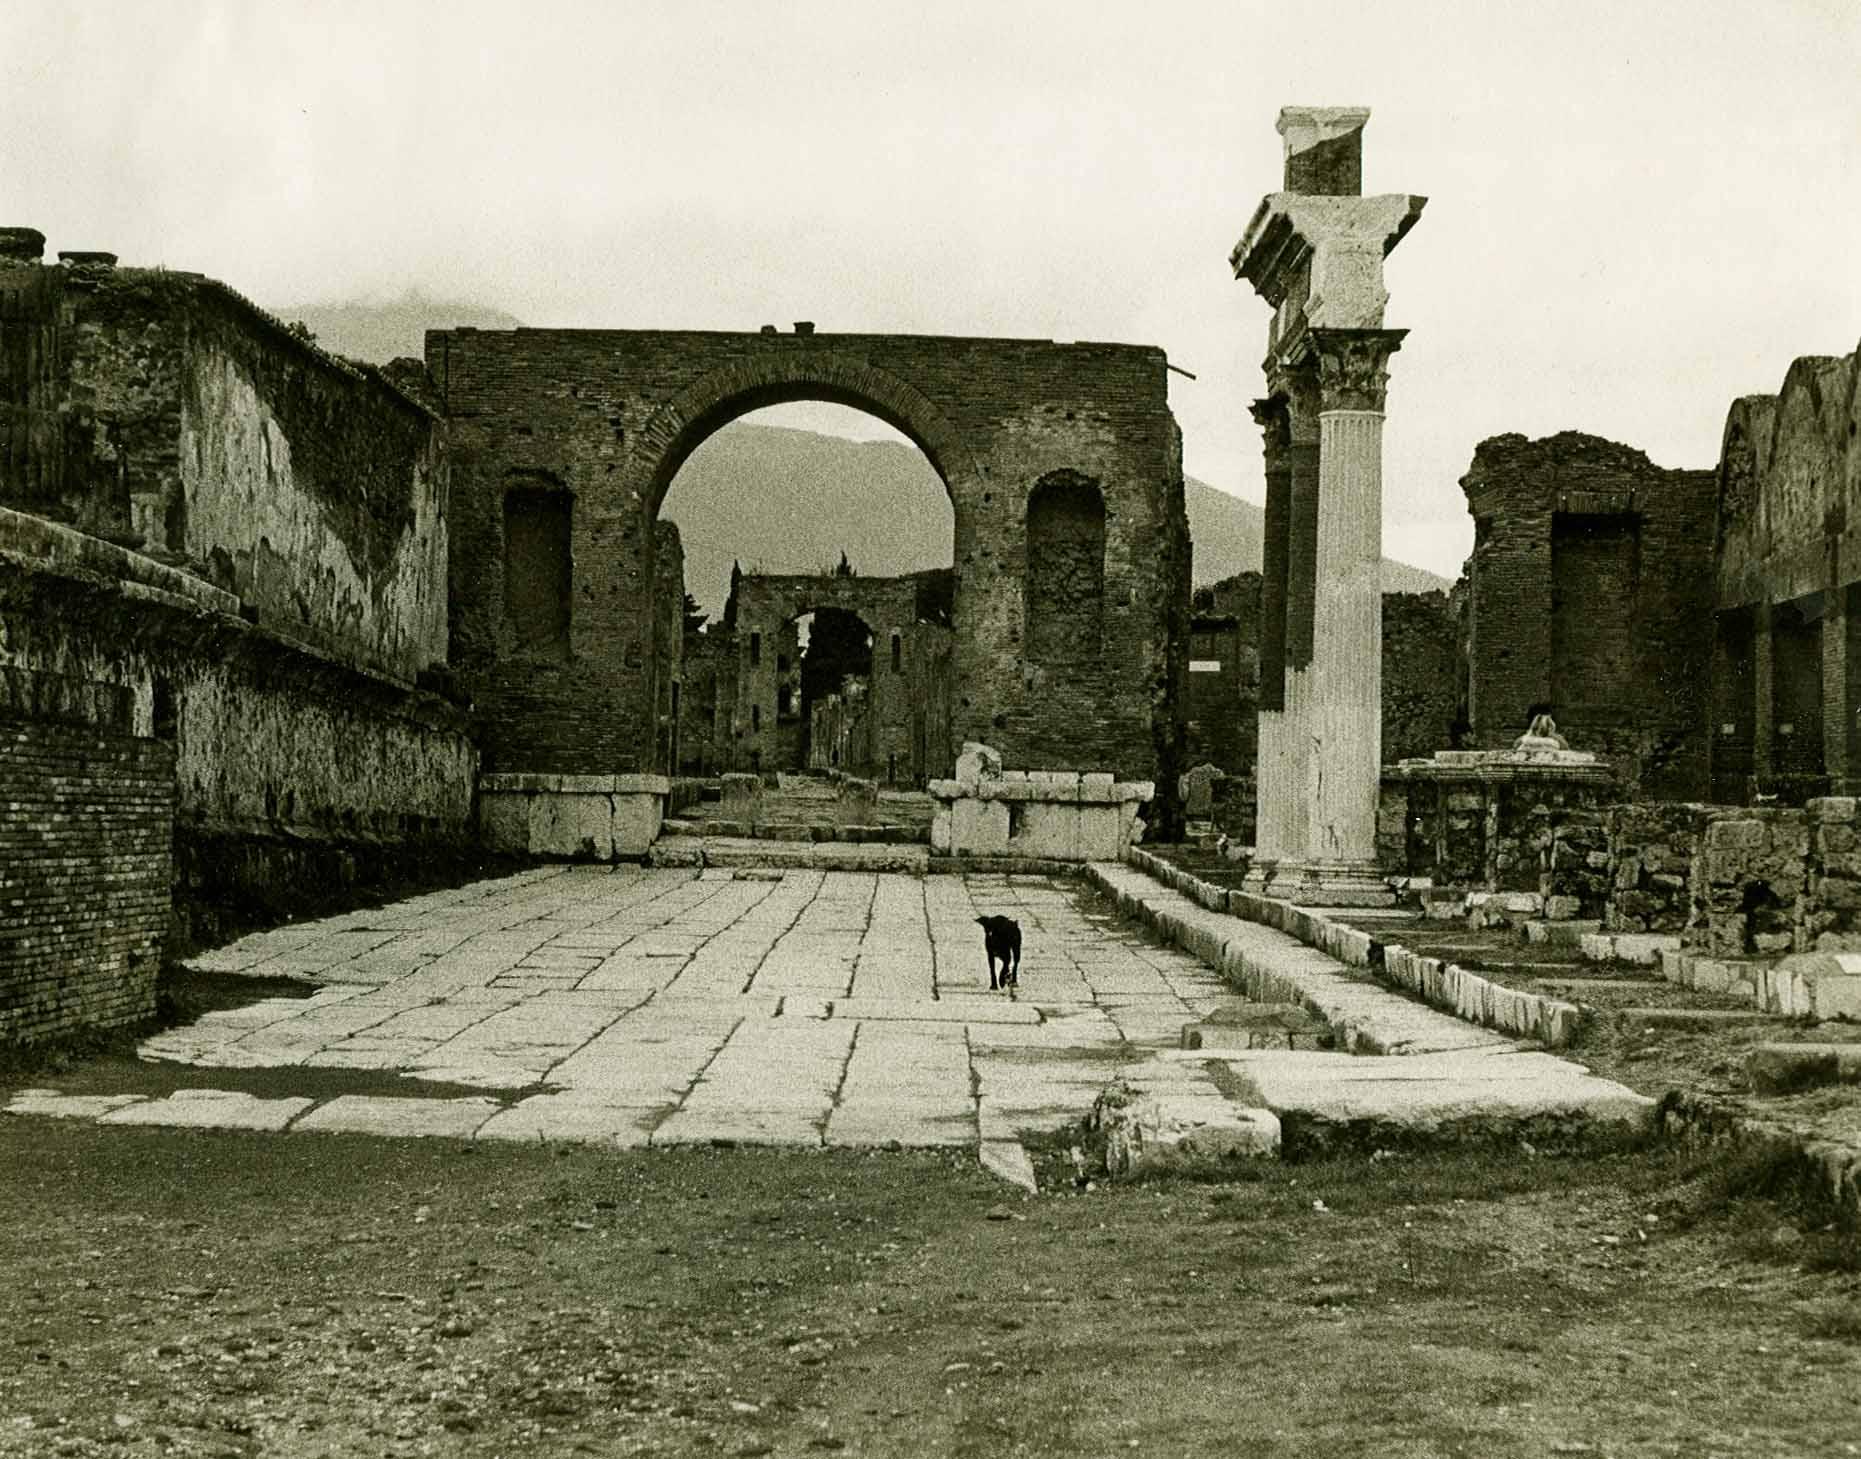 Dog Walking in Pompei Italy lr.jpg